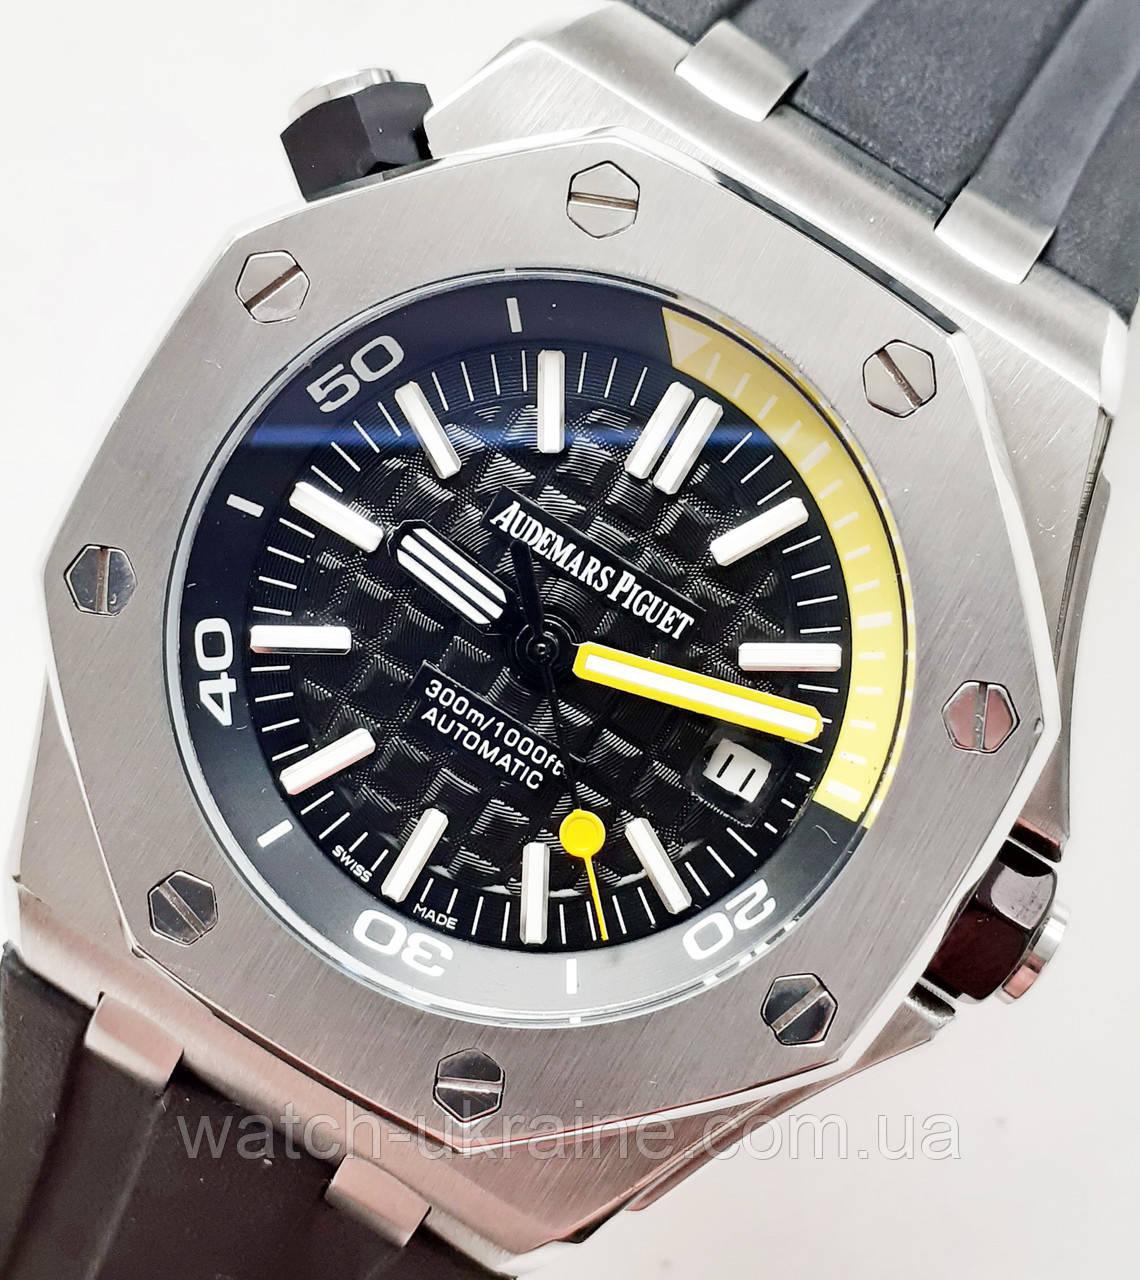 Часы Audemars Piguet Royal Oak Offshore Automatik.класс ААА